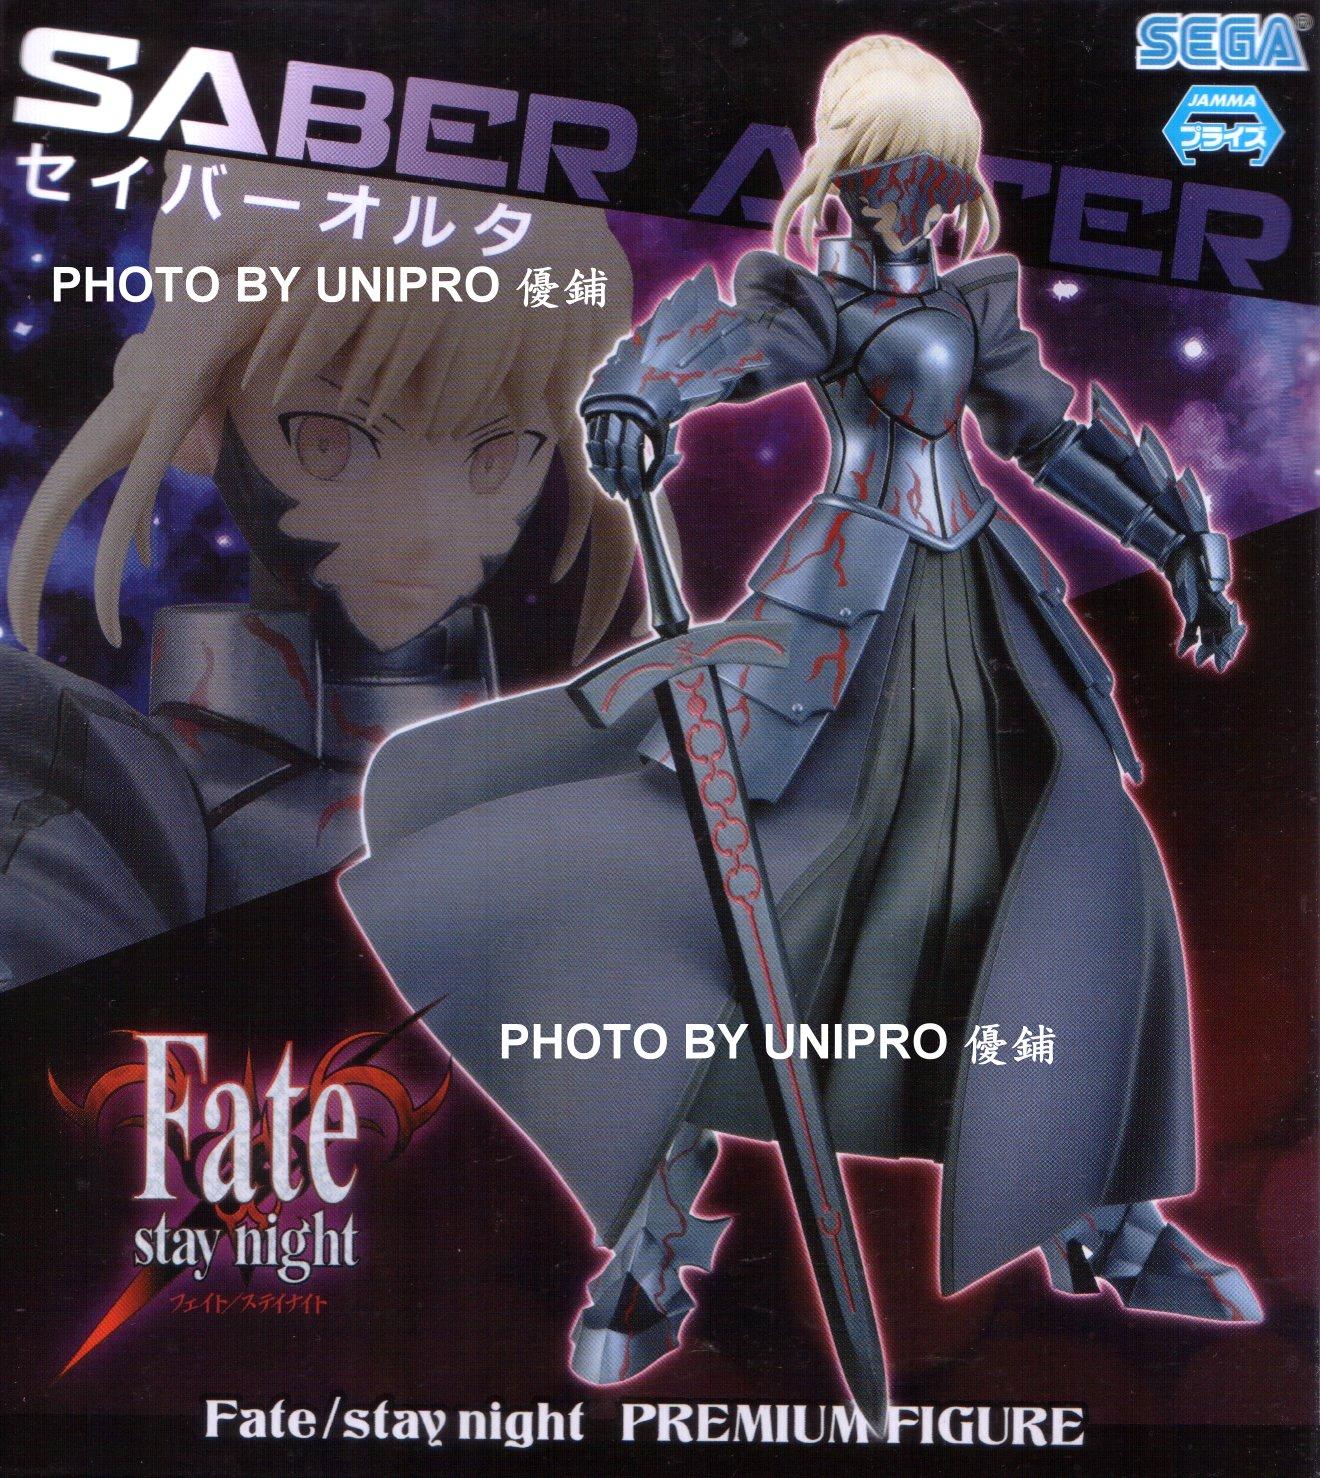 日版 SEGA Fate/stay night Premium Saber Alter 黑賽巴 公仔